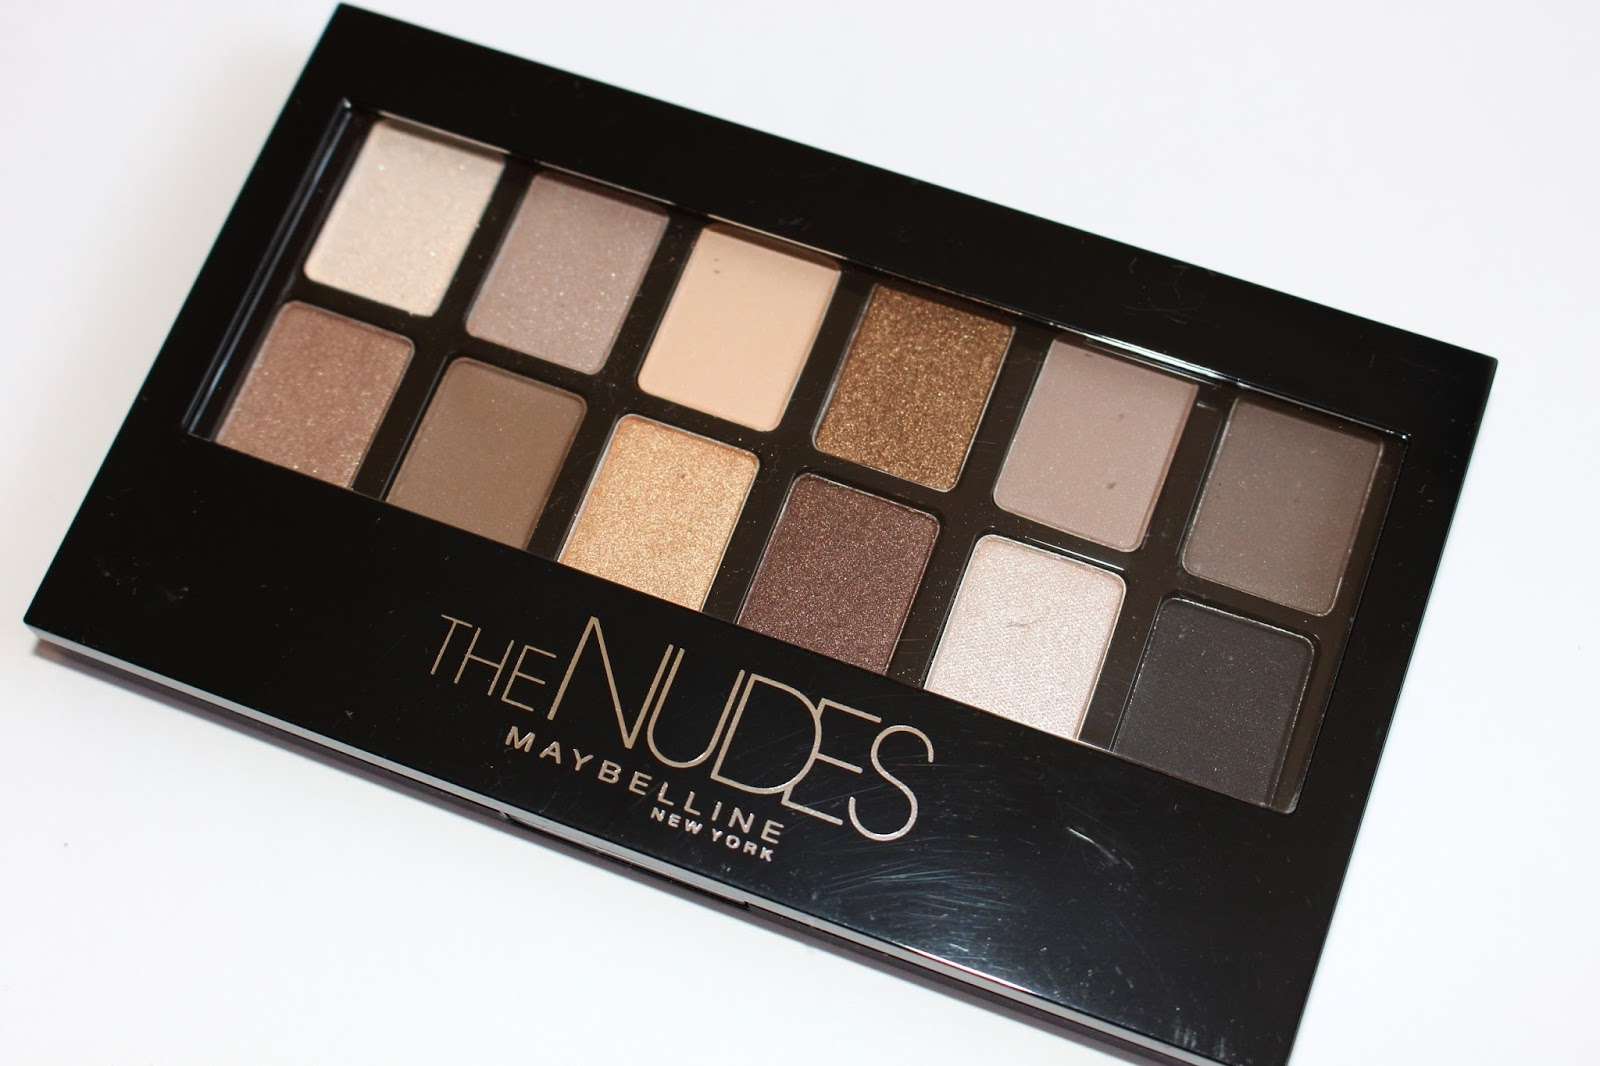 Maybelline The Nudes paletka - Blogerky.cz